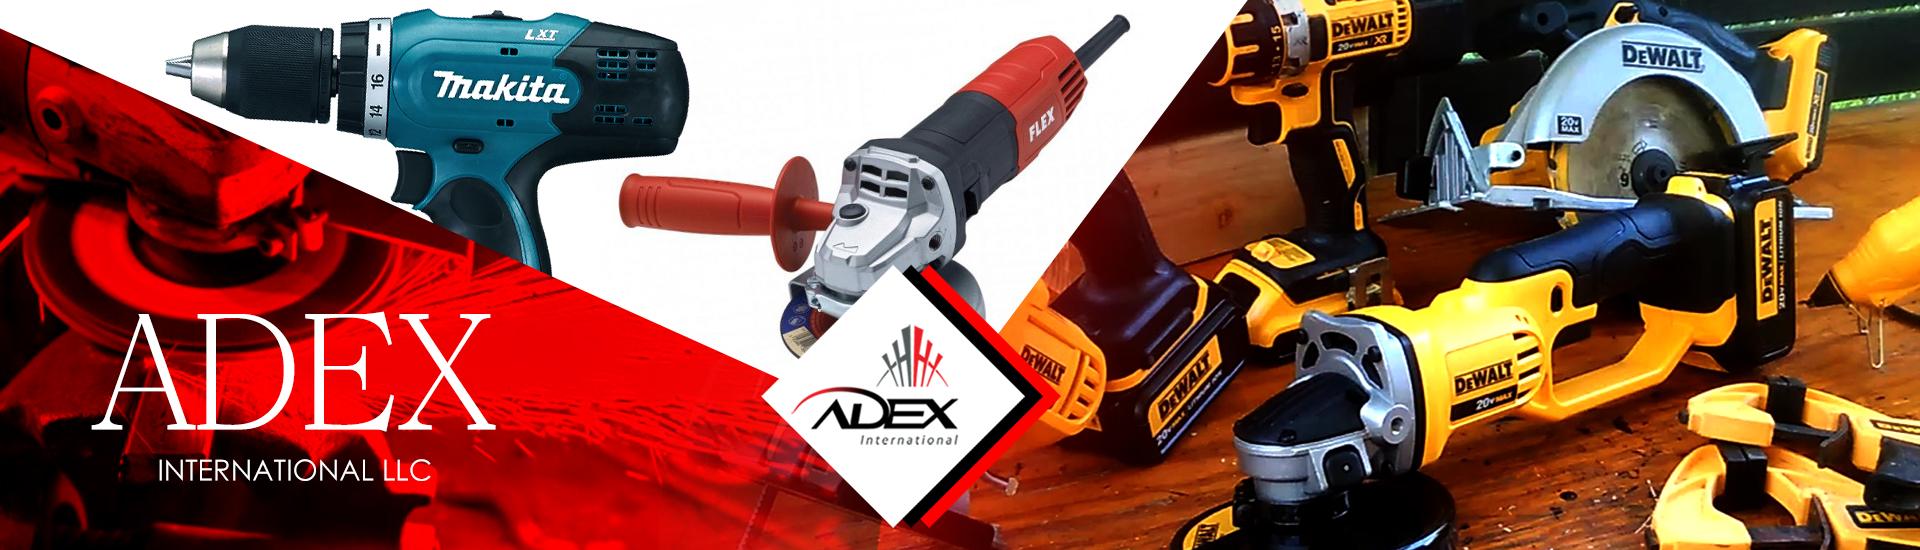 ADEX INTERNATIONAL LLC